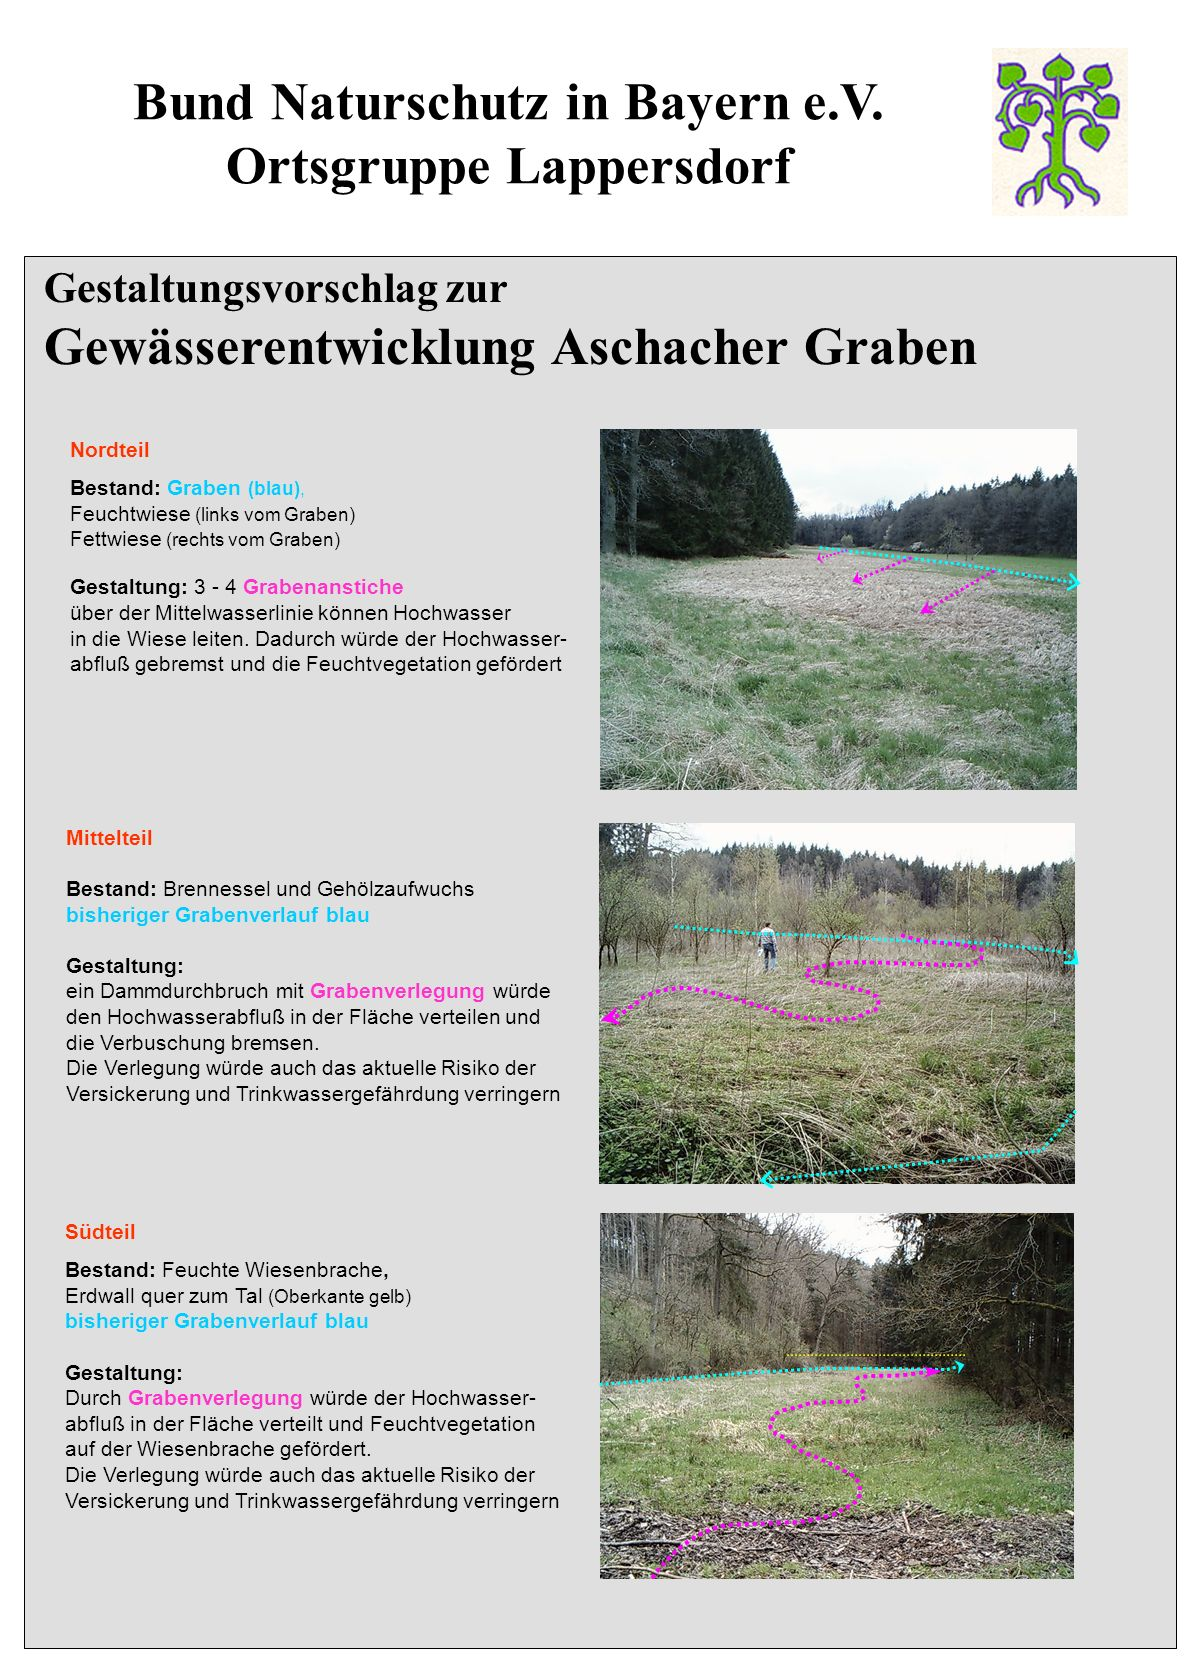 Bund Naturschutz in Bayern e.V. Ortsgruppe Lappersdorf